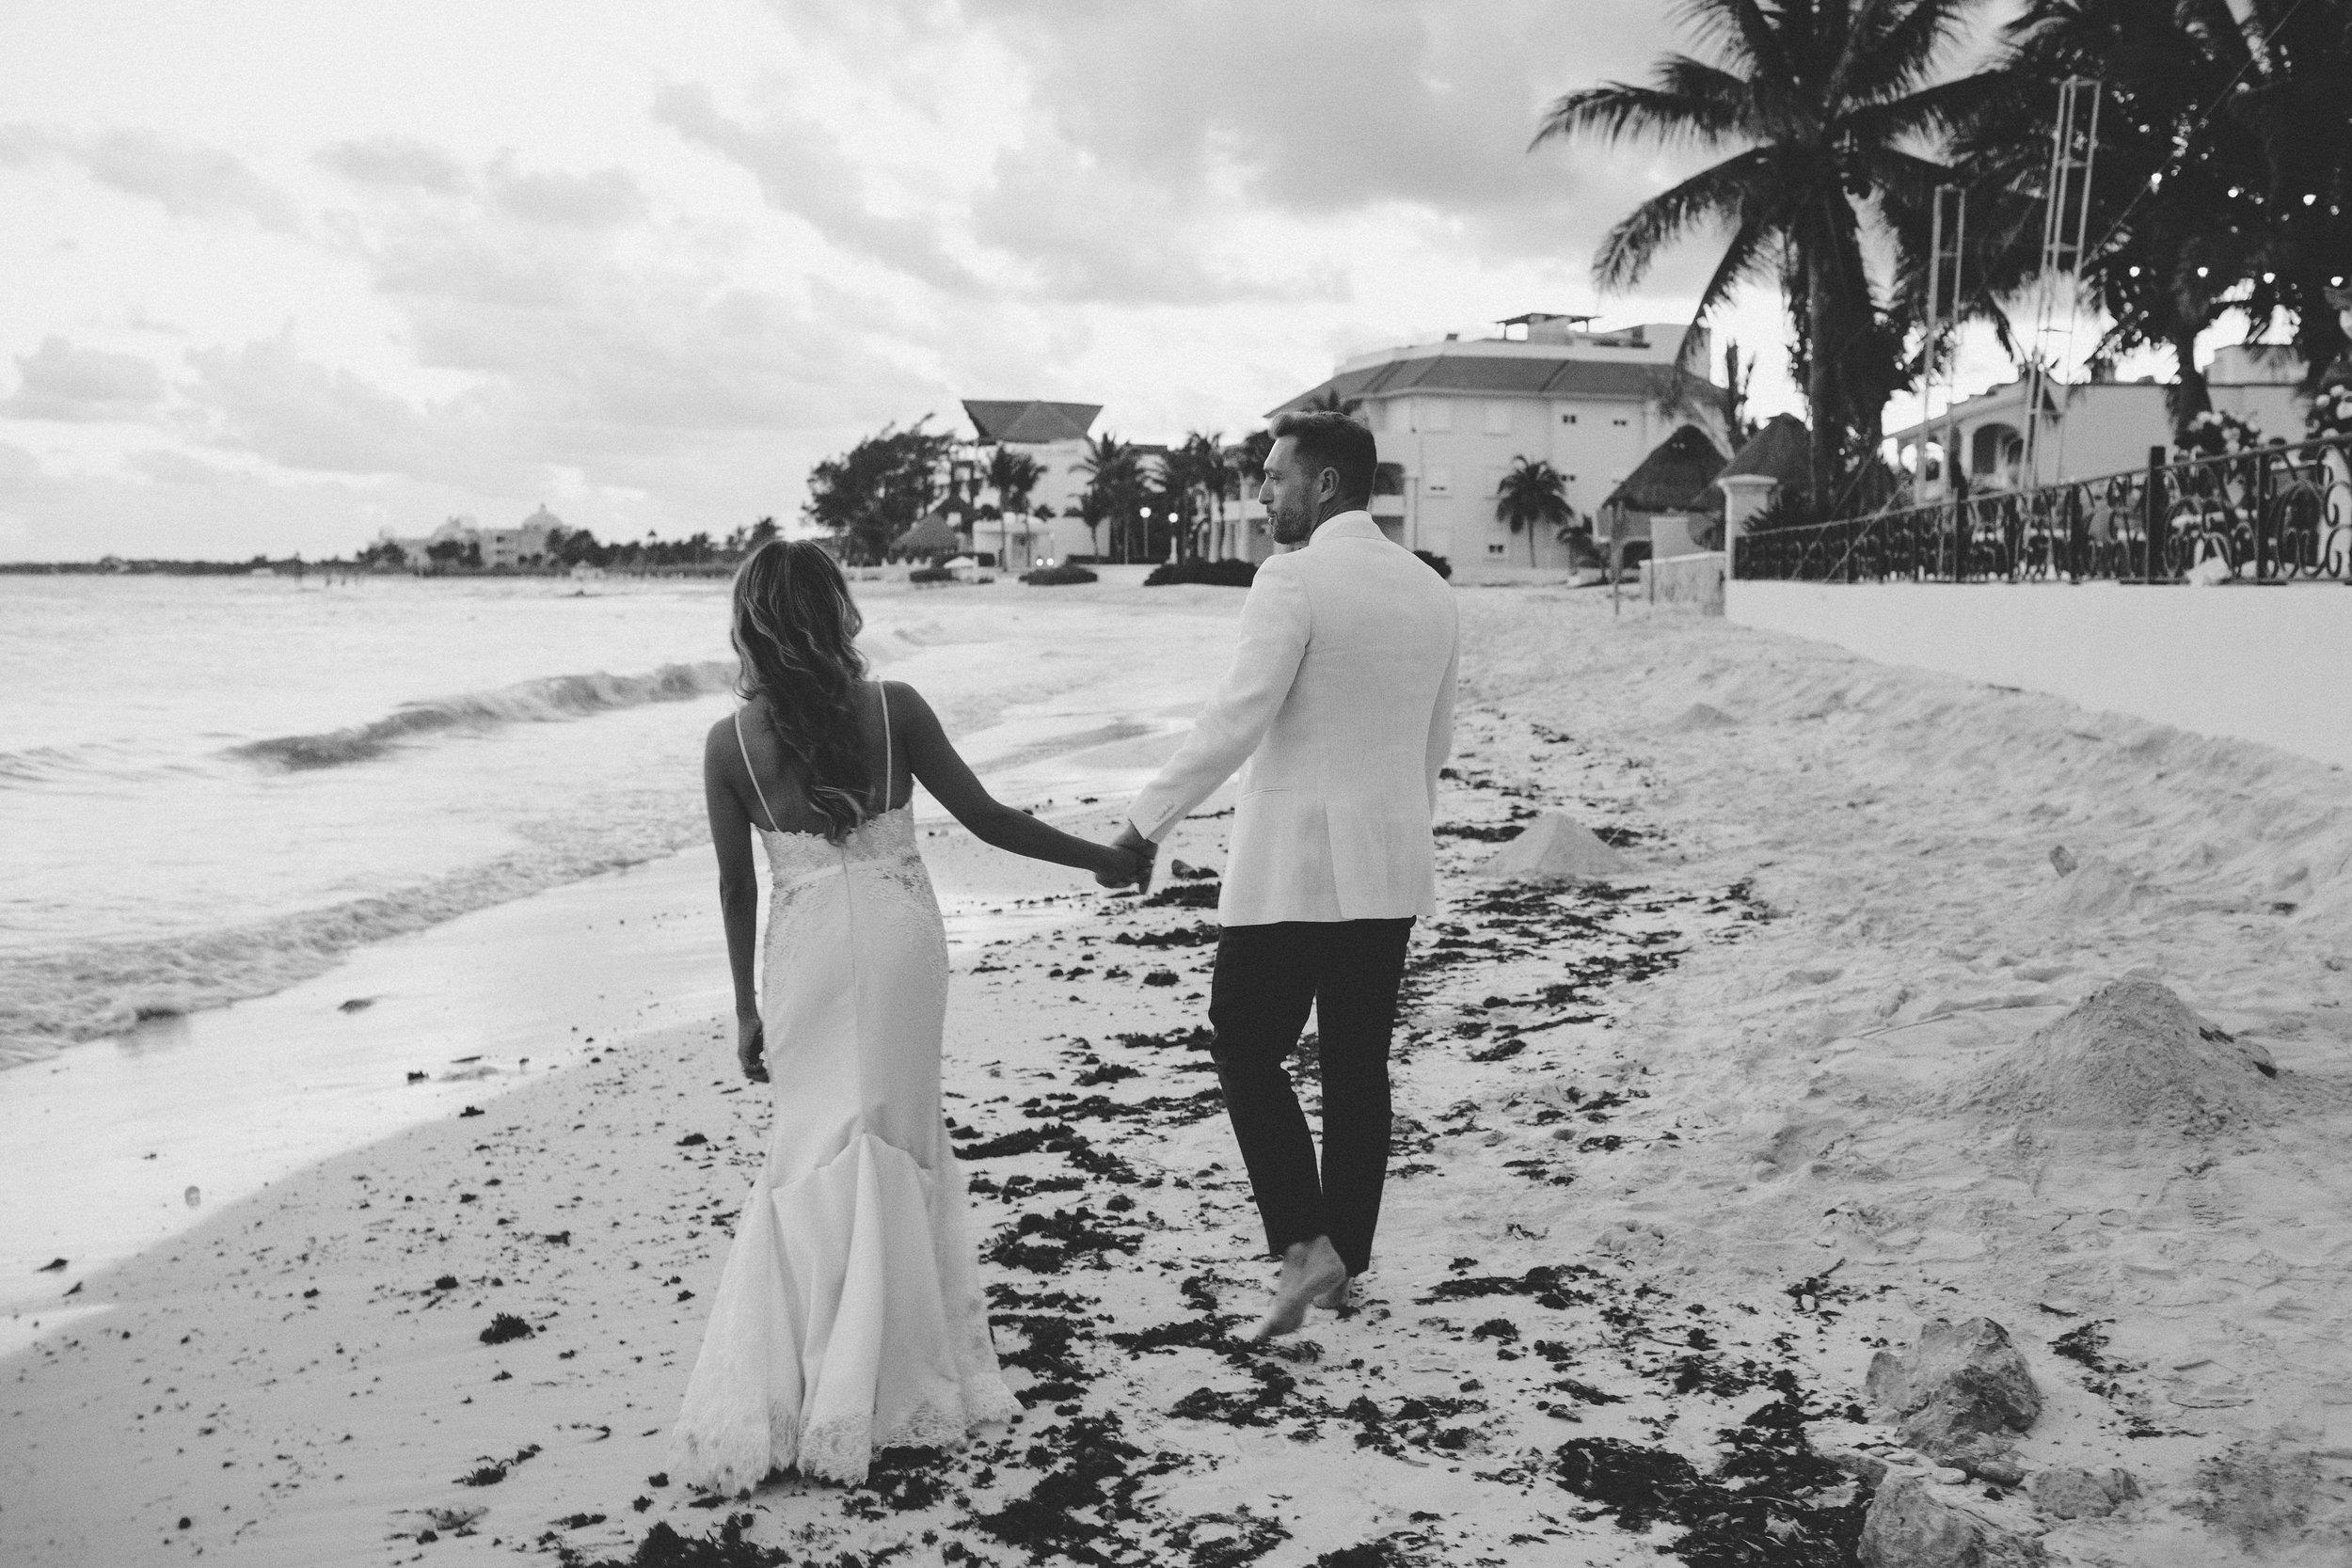 mexico_wedding_cancun_villa_la_joya_evangeline_lane_123.jpg